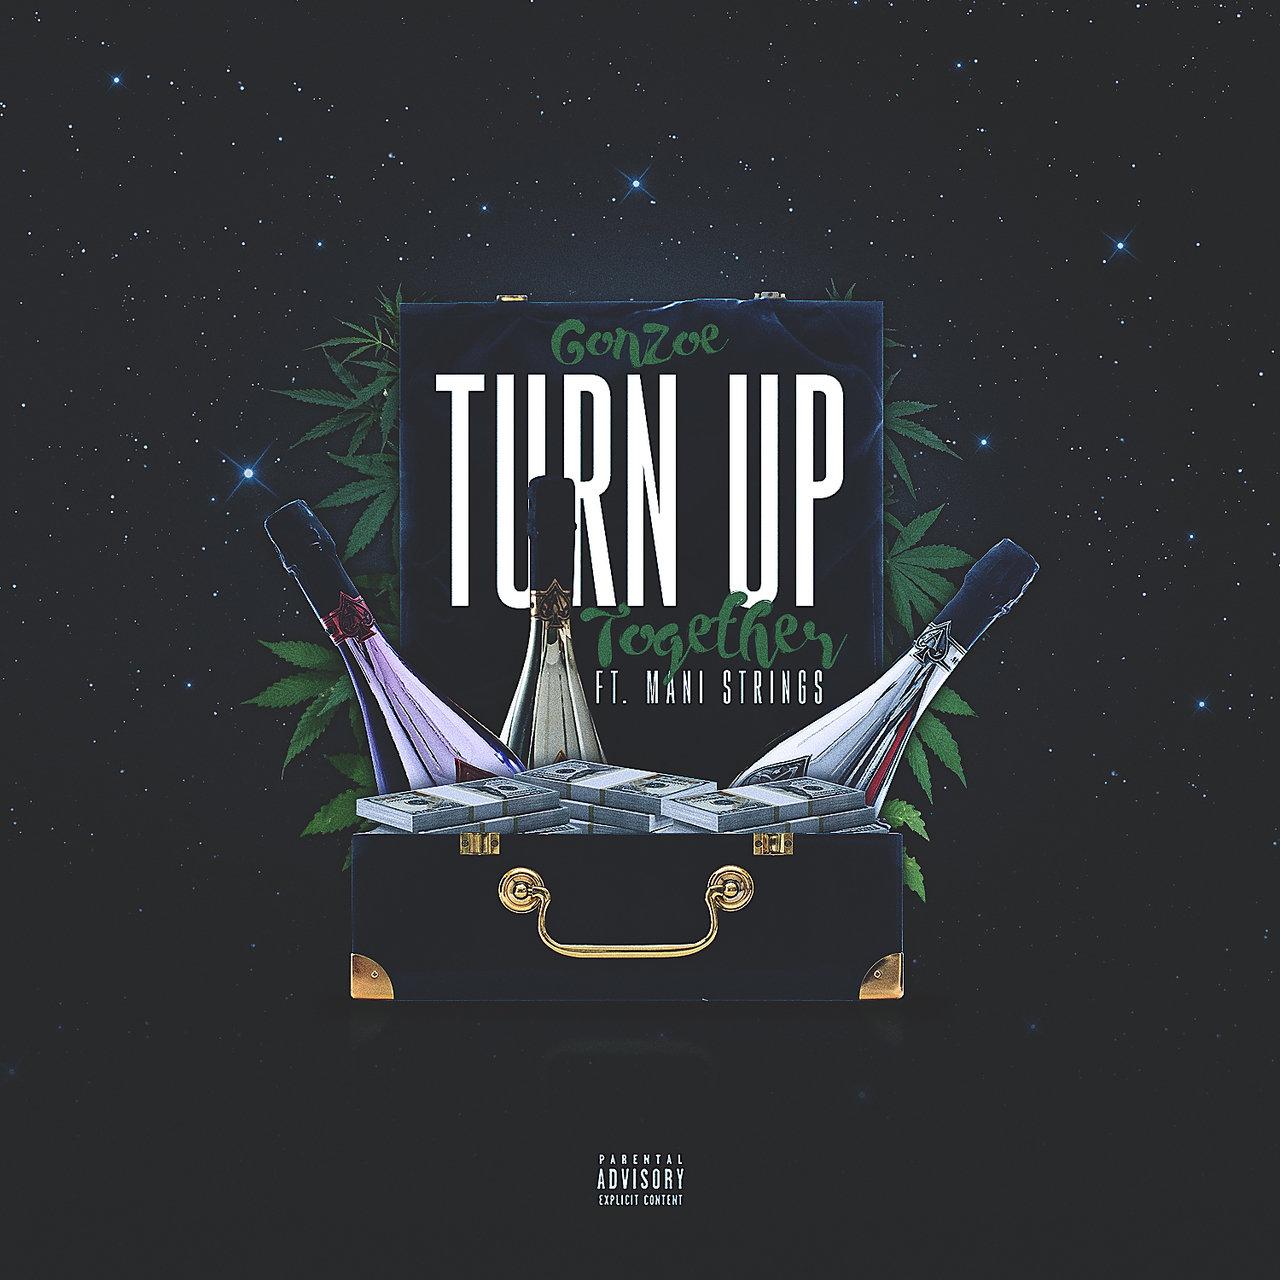 http://rap.3dn.ru/00000c/00-Gonzoe-Turn_up_Together-front.jpg